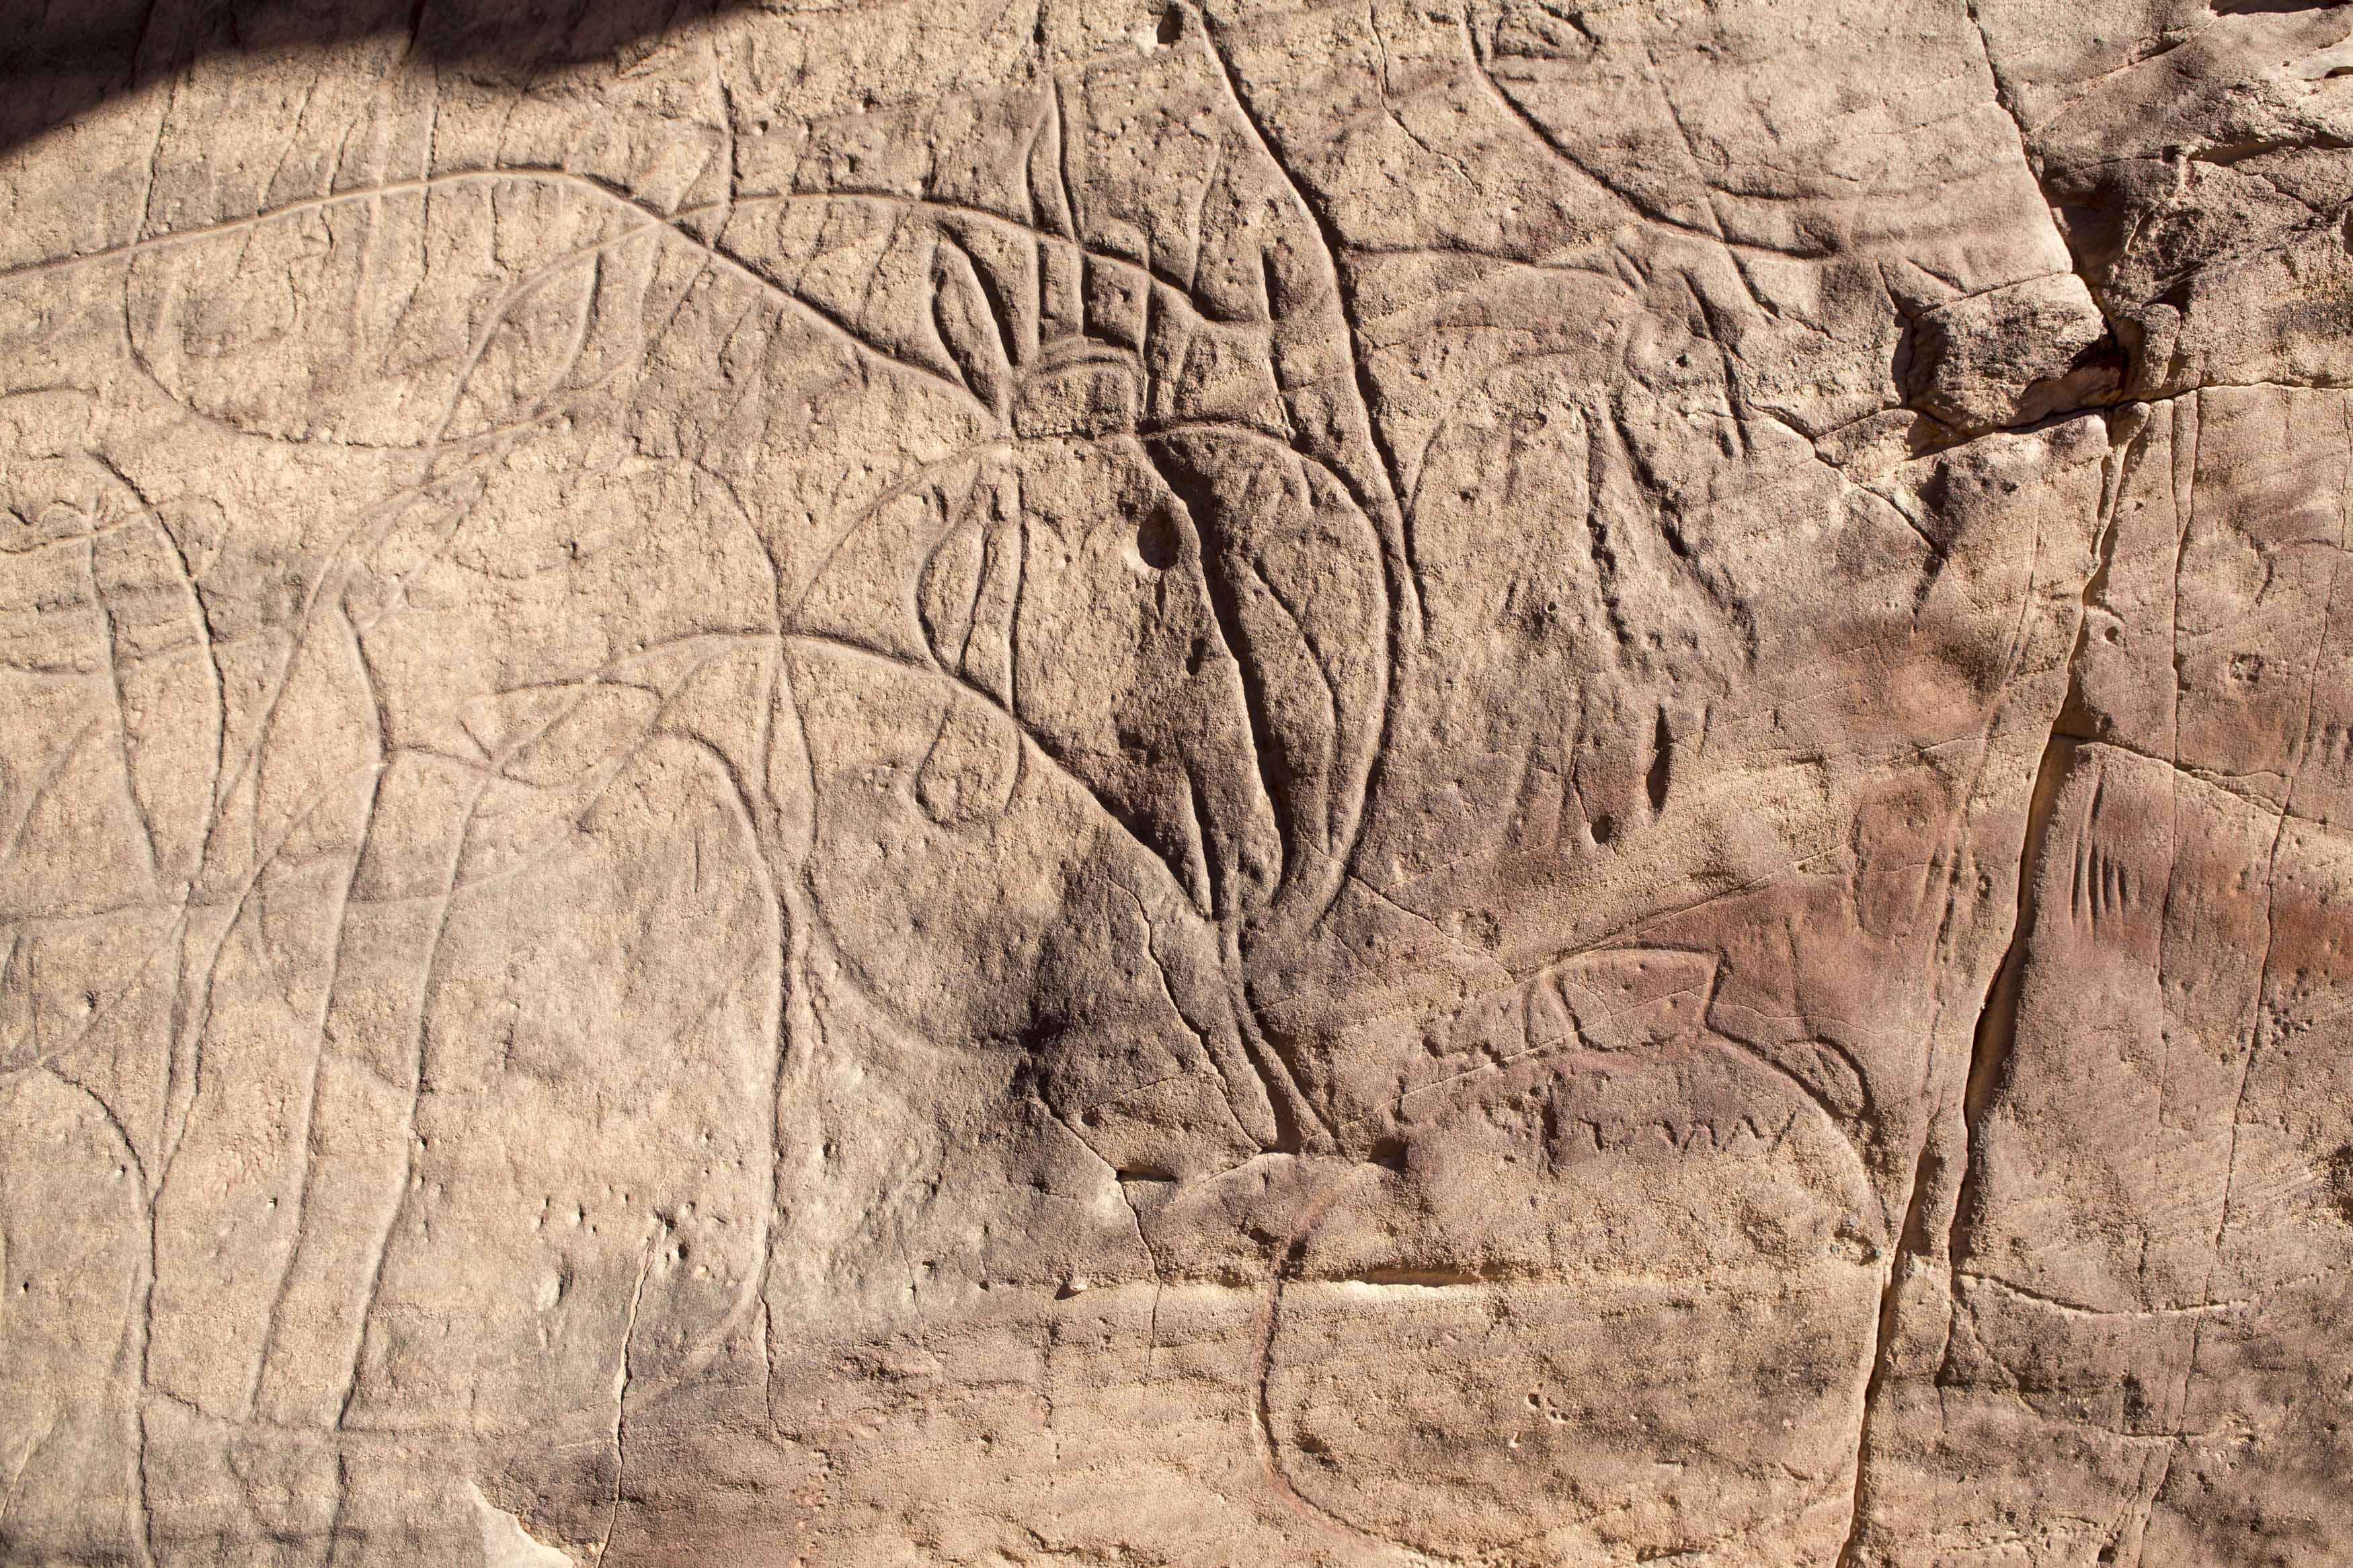 Cave engraving depicting a cow and several other animals on a wall in the Tadrart.The Tadrart (200 km southeast of Djanet) is located in the south of the Tassili N'Ajjer National Park and is part of one of the most beautiful desert in the world but above all the central Sahara.From huge canyons to cliffs carved with rocky peaks of various shapes mix with dunes of colored sand with yellow and red reflections. The Tadrart, Algeria-February 6, 2017.Gravure rupestre représentant une vache et plusieurs autres animaux sur une paroi dans la Tadrart. La Tadrart (200 km au sud-est de Djanet) se situe dans le sud du Parc National du Tassili N'Ajjer et il fait partie d'un des plus beau désert au monde mais avant tout du Sahara central. D'immenses canyons aux falaises sculptées avec de pitons rocheux aux formes les plus diverses  se mélangent avec des dunes de sable coloré aux reflets jaune et rouge. La Tadrart, Algérie-6 février 2017.